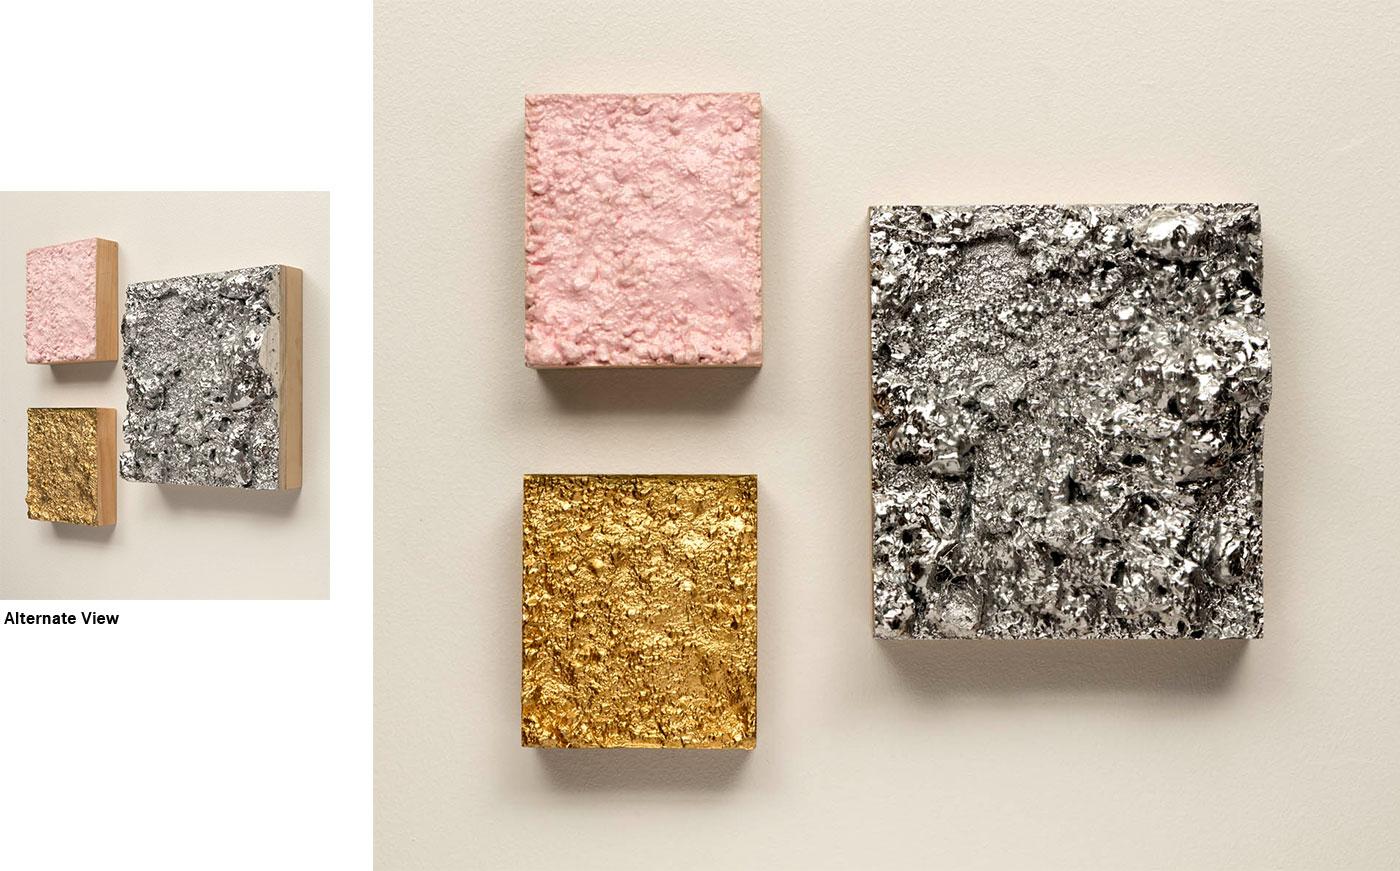 Audrey Travis - Terra/Form IX, Untitled, Terra/Form VIII